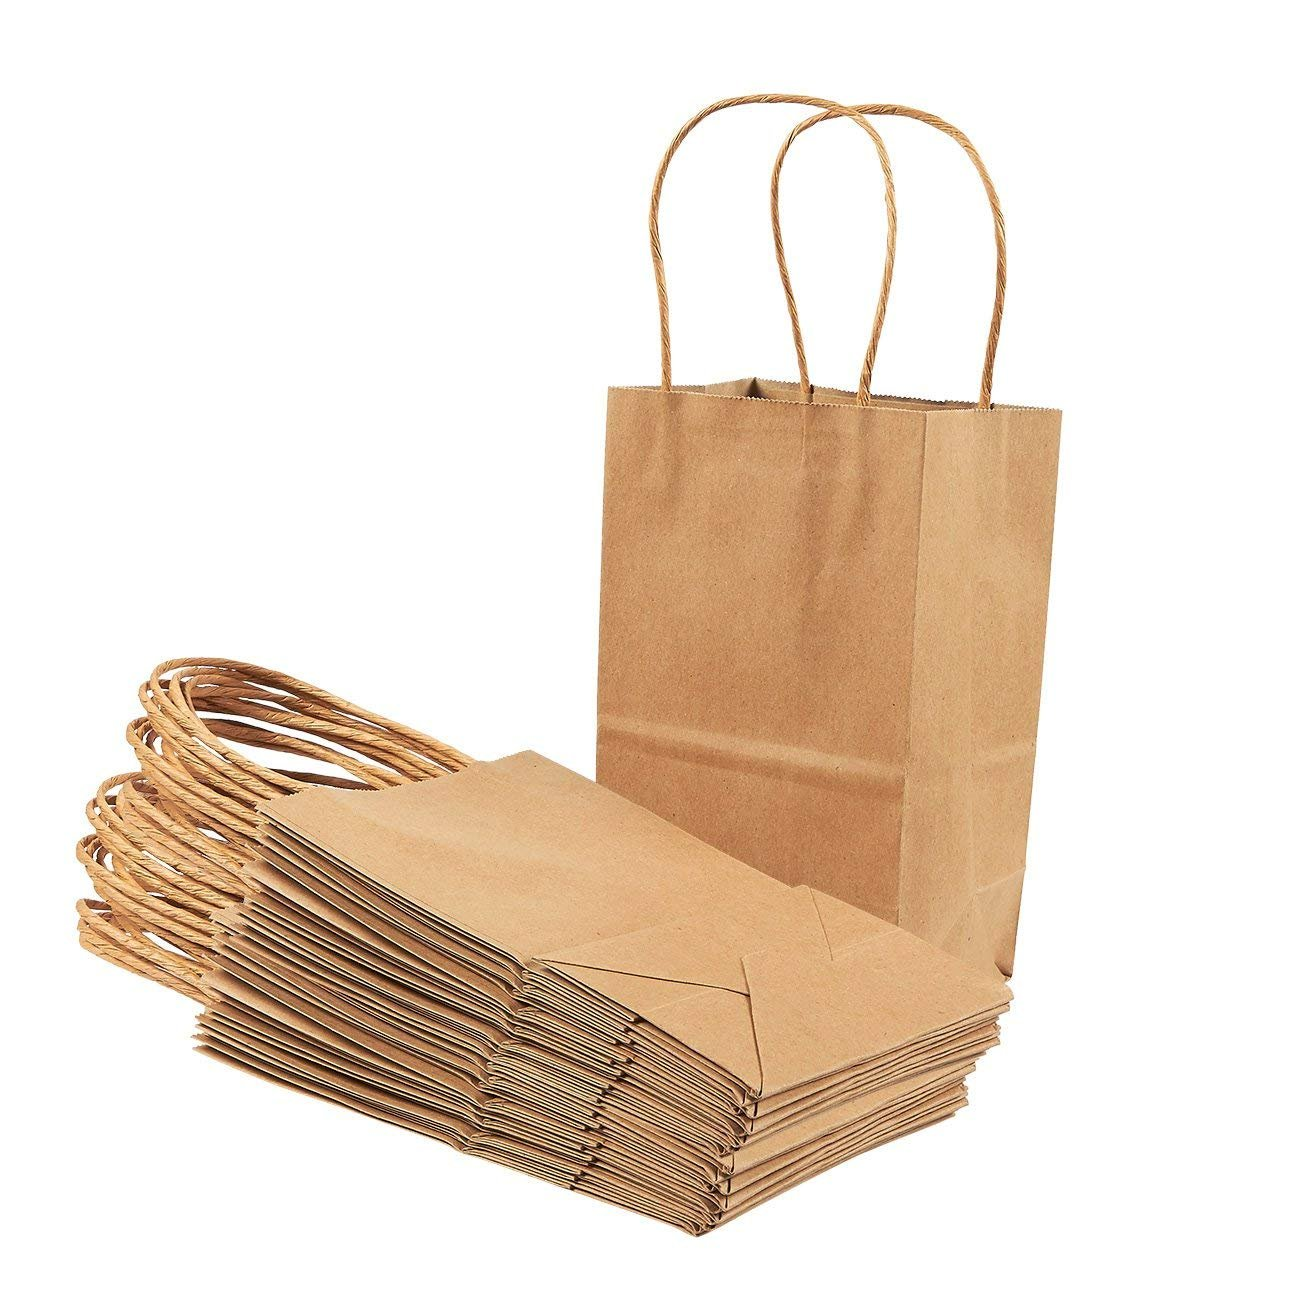 Amazon.com: Bolsas de papel kraft marrón con asas, ideales ...